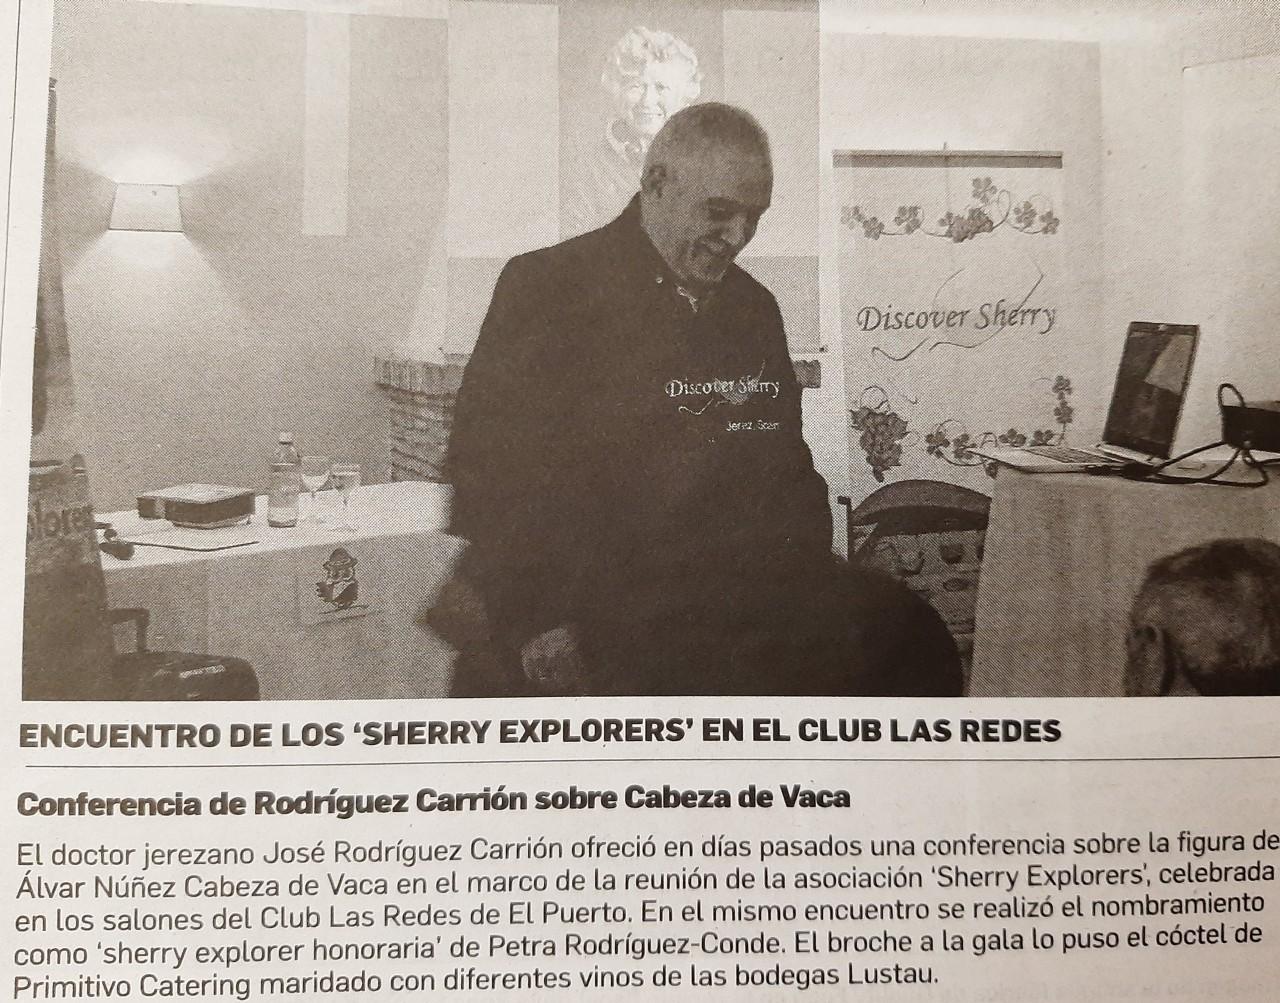 Diario de Jerez: Sherry Explorers en LasRedes